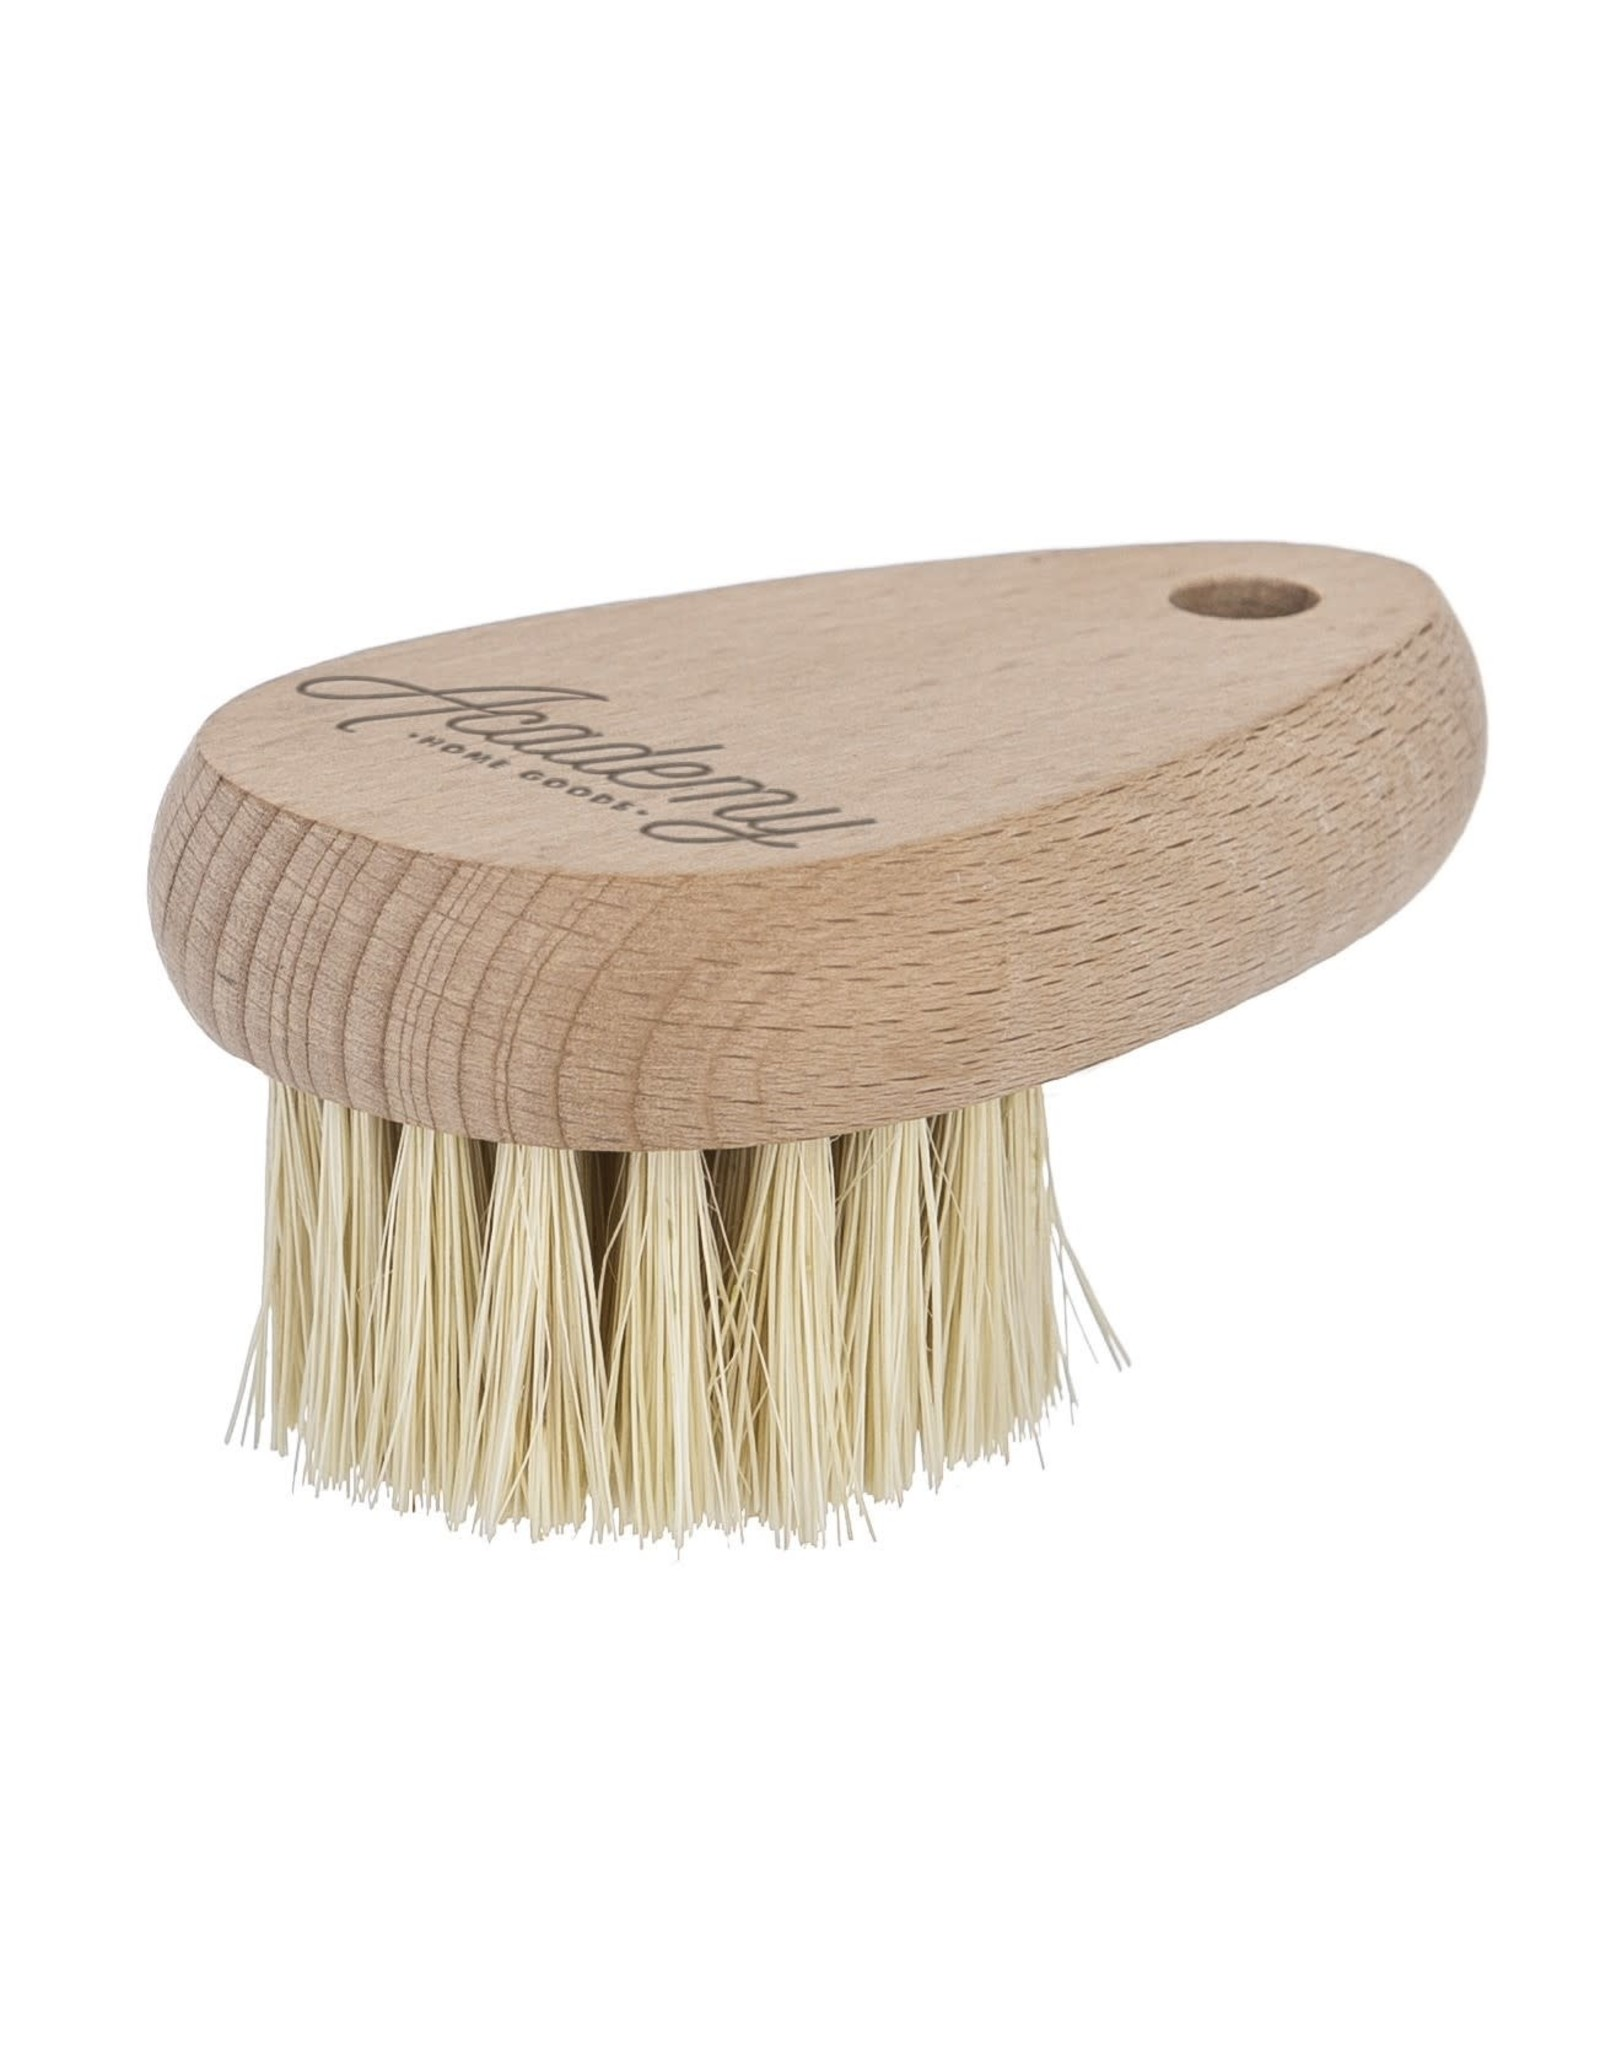 Academy Dickens Nail Brush 8x5x3.5cm